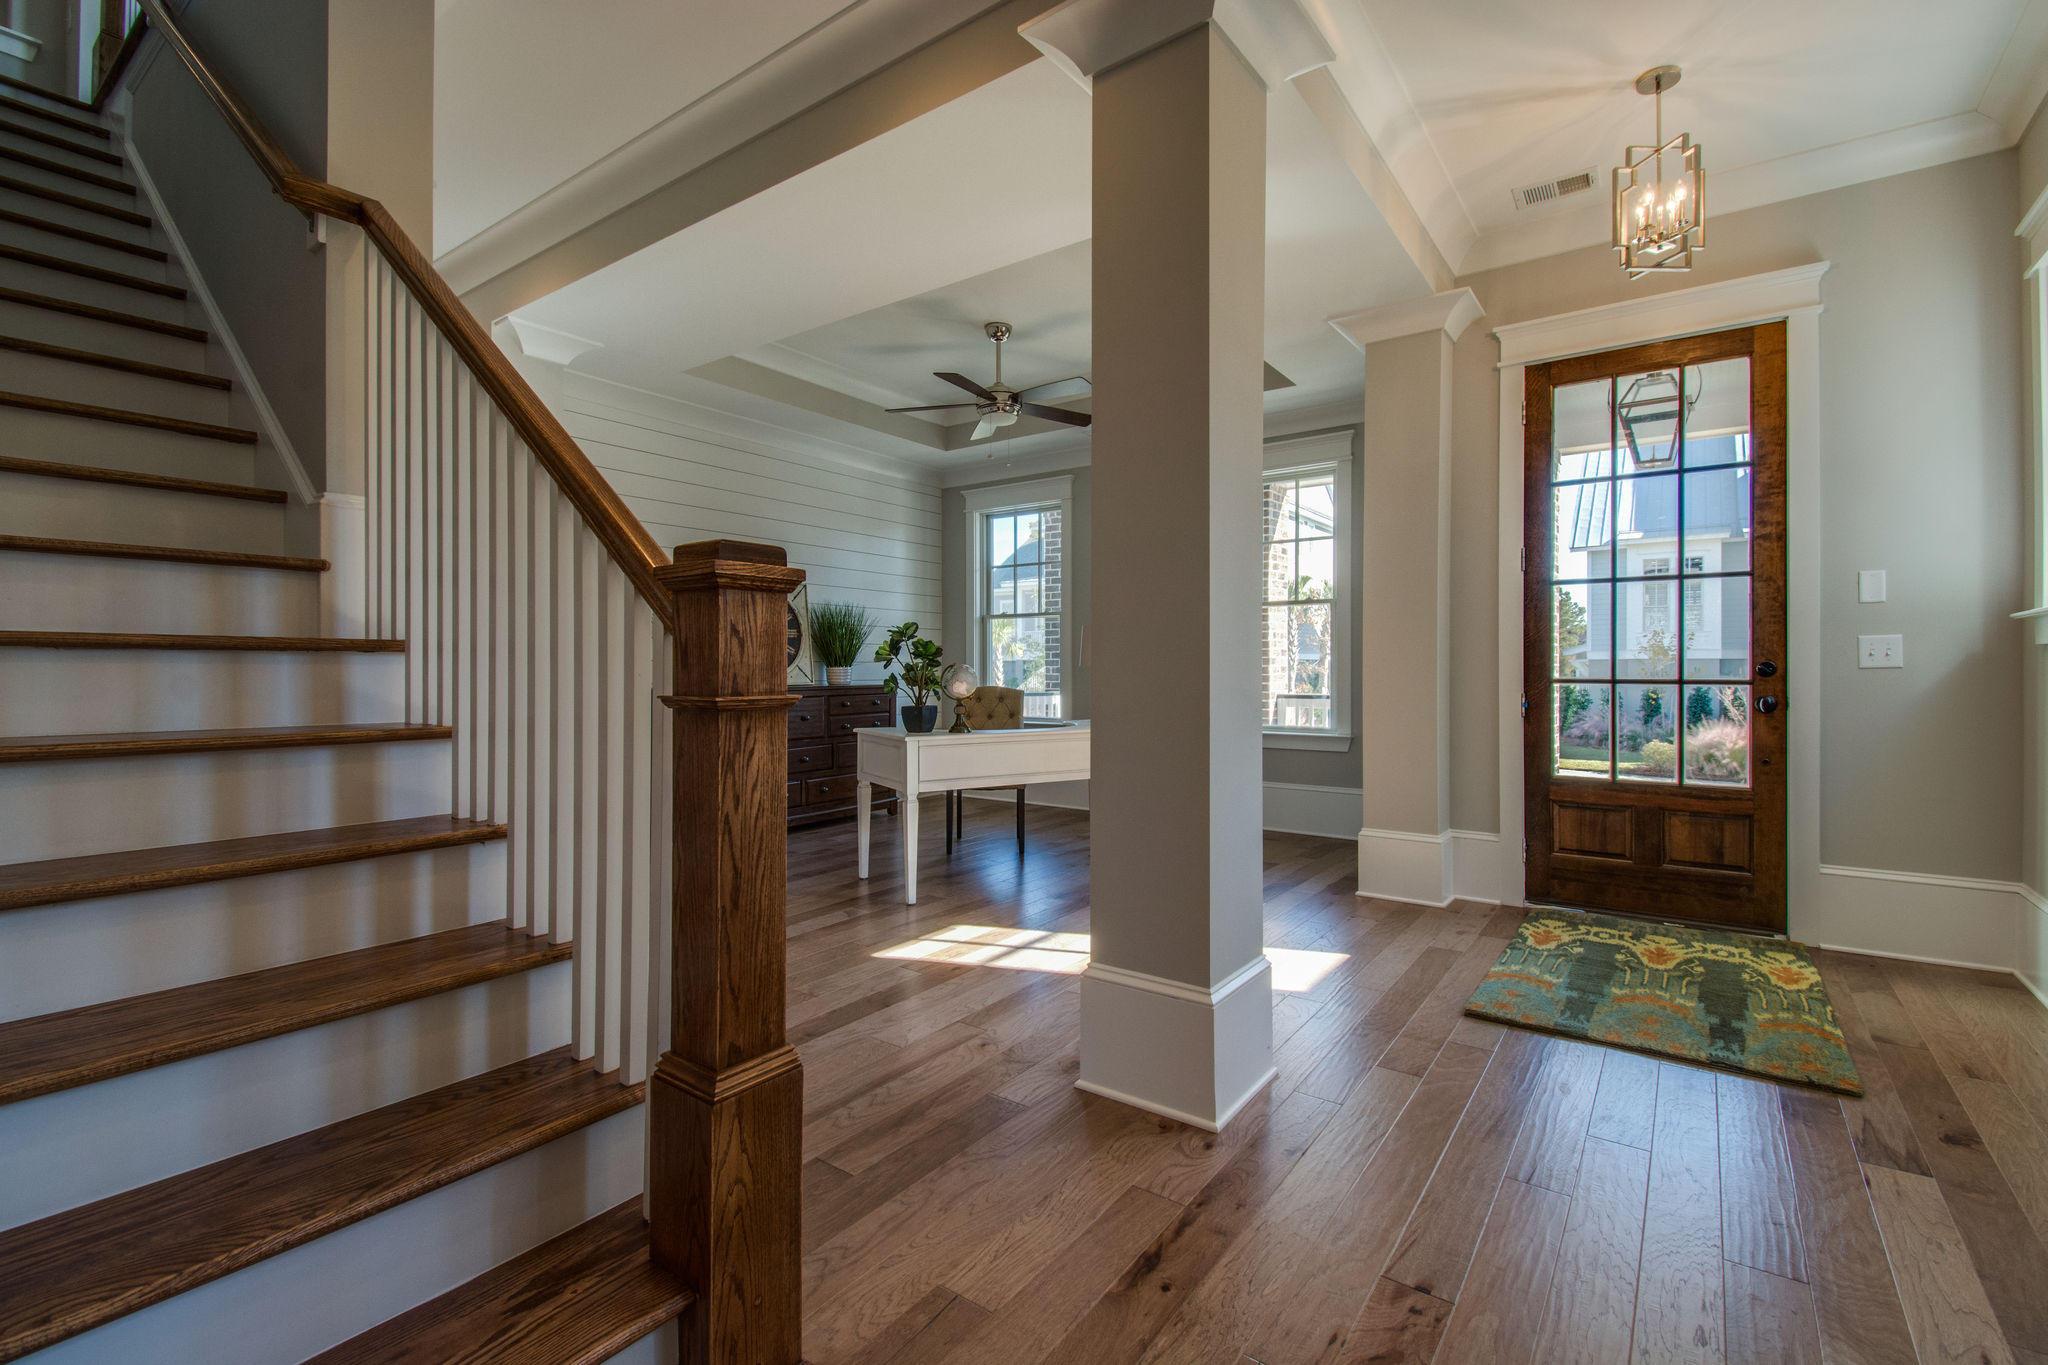 Daniel Island Park Homes For Sale - 112 Brailsford, Charleston, SC - 18